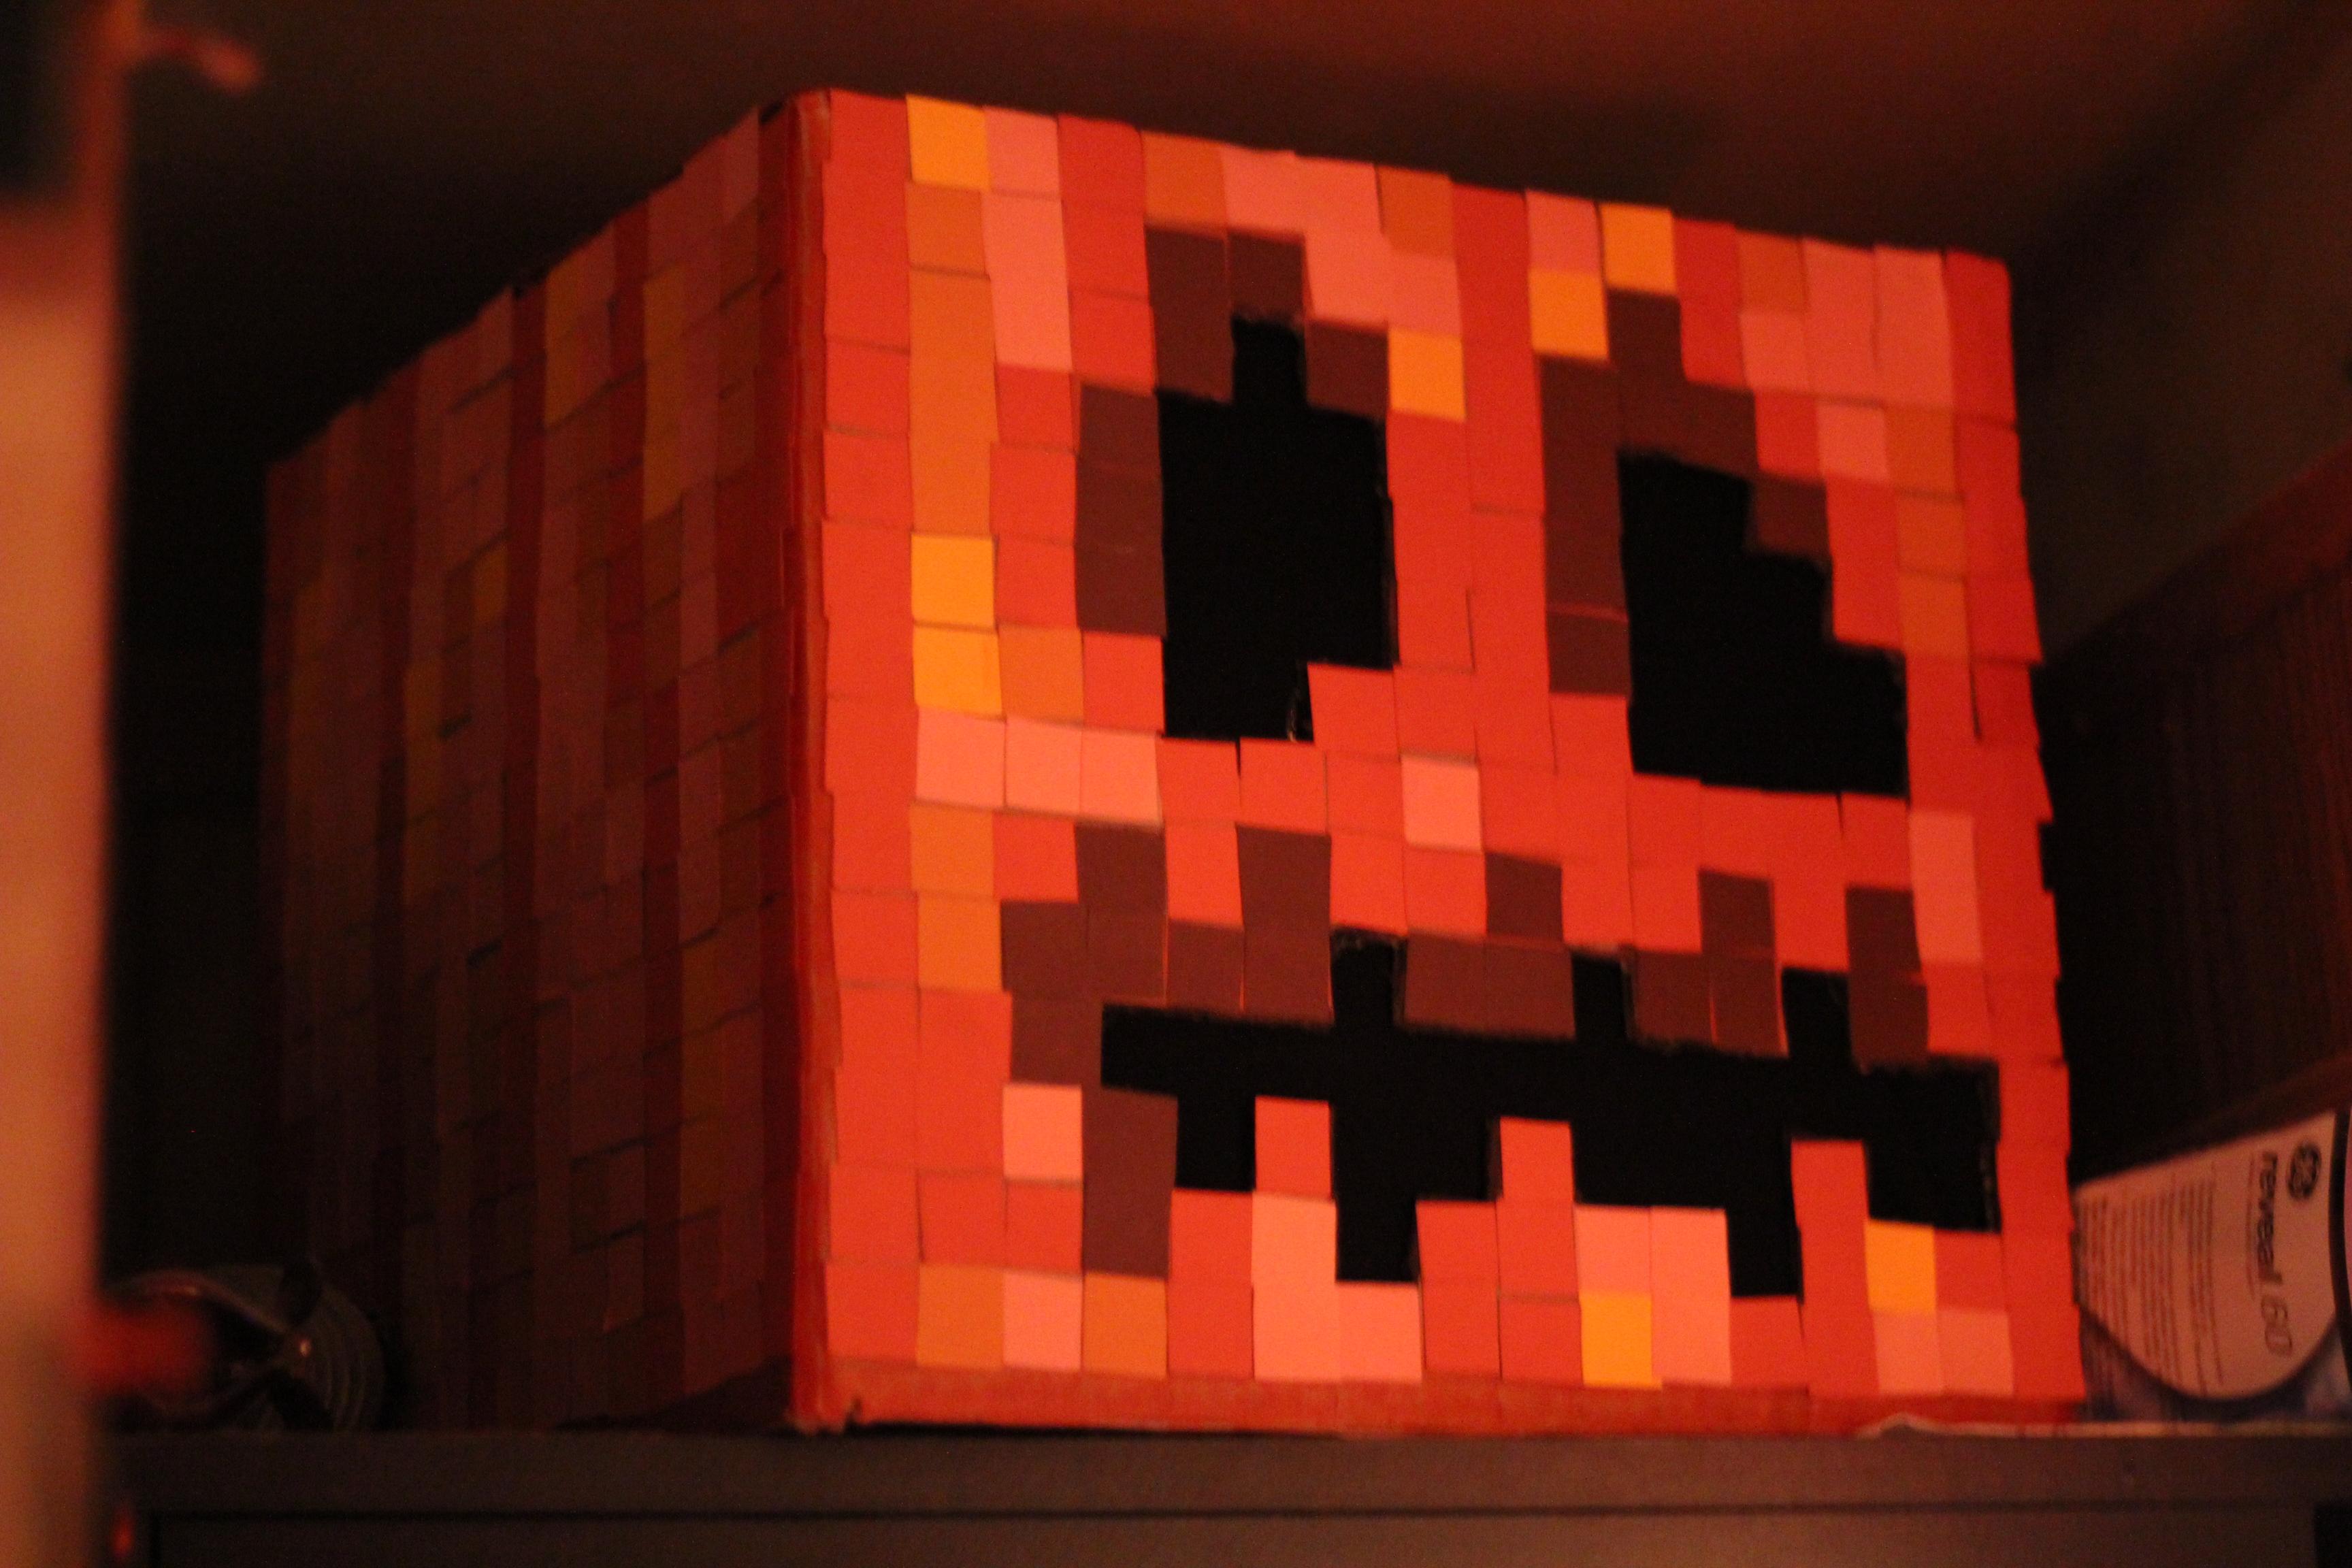 Minecraft Pumpkin by SaoirseRoisin